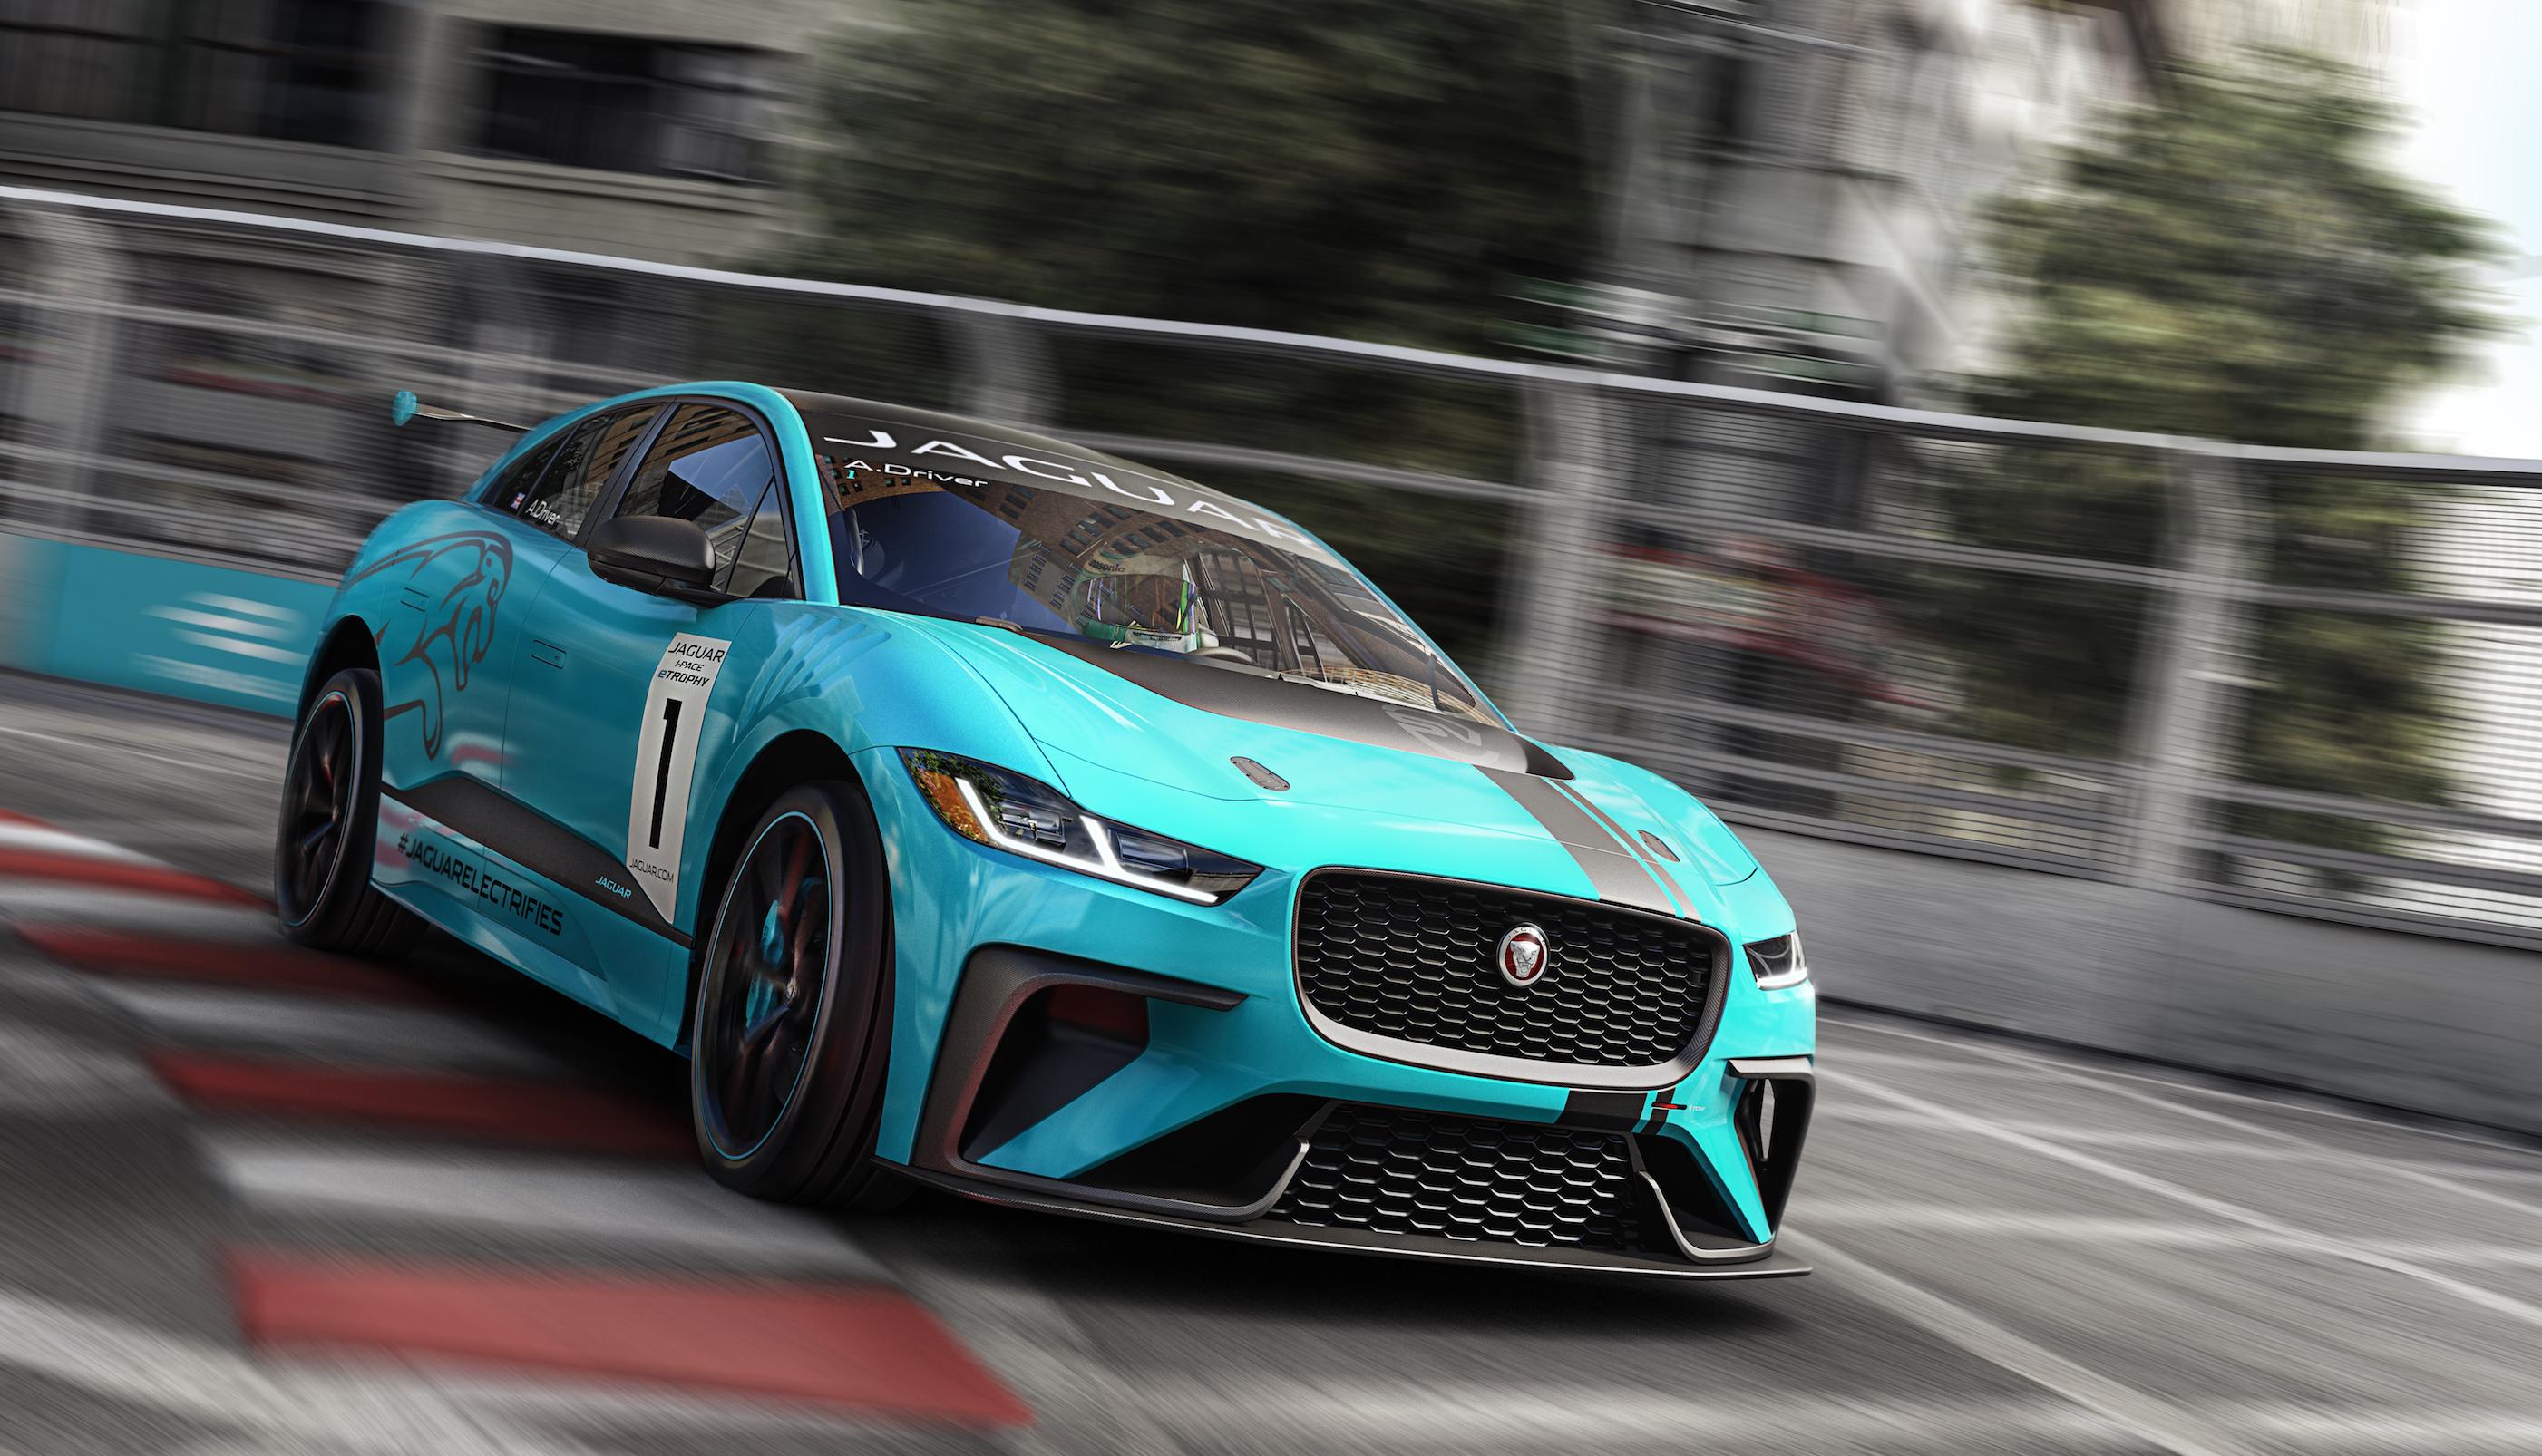 A bright blue Jaguar I-Pace race vehicle, shown on a track.